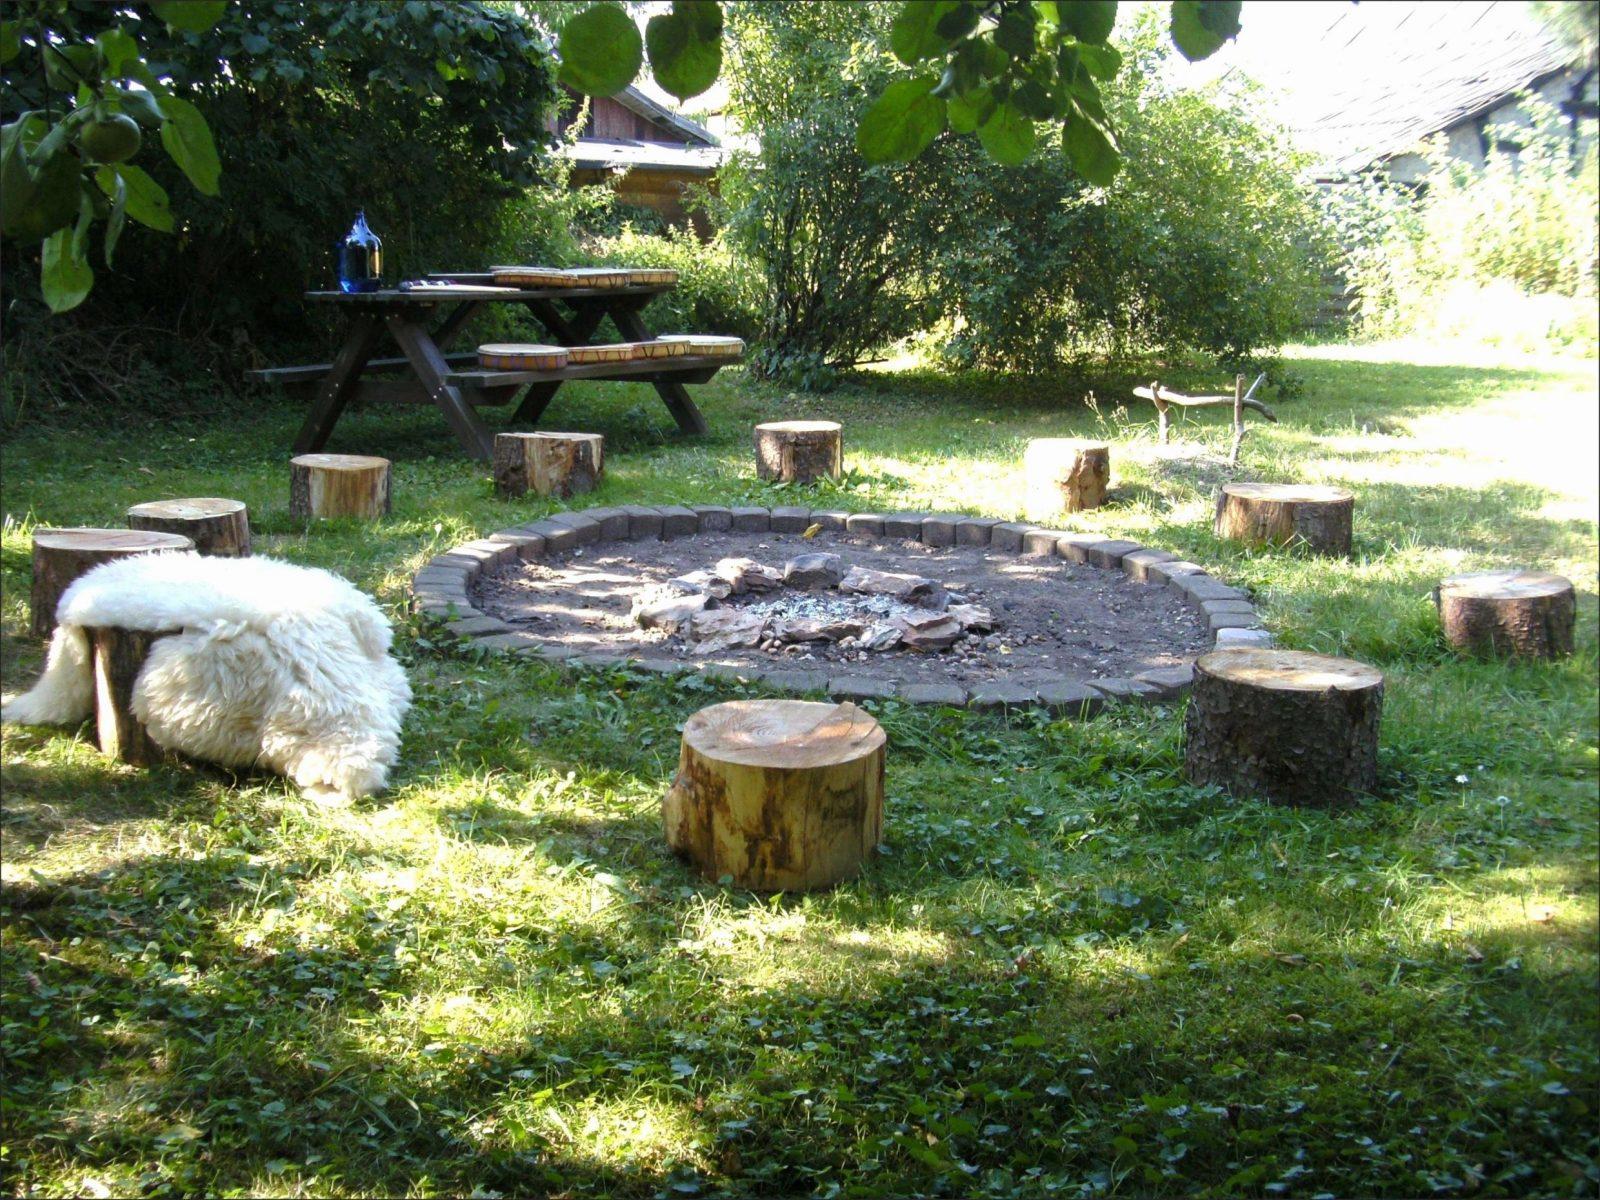 Garten Springbrunnen Selber Bauen Genial Die Meisten Schön von Garten Springbrunnen Selber Bauen Bild